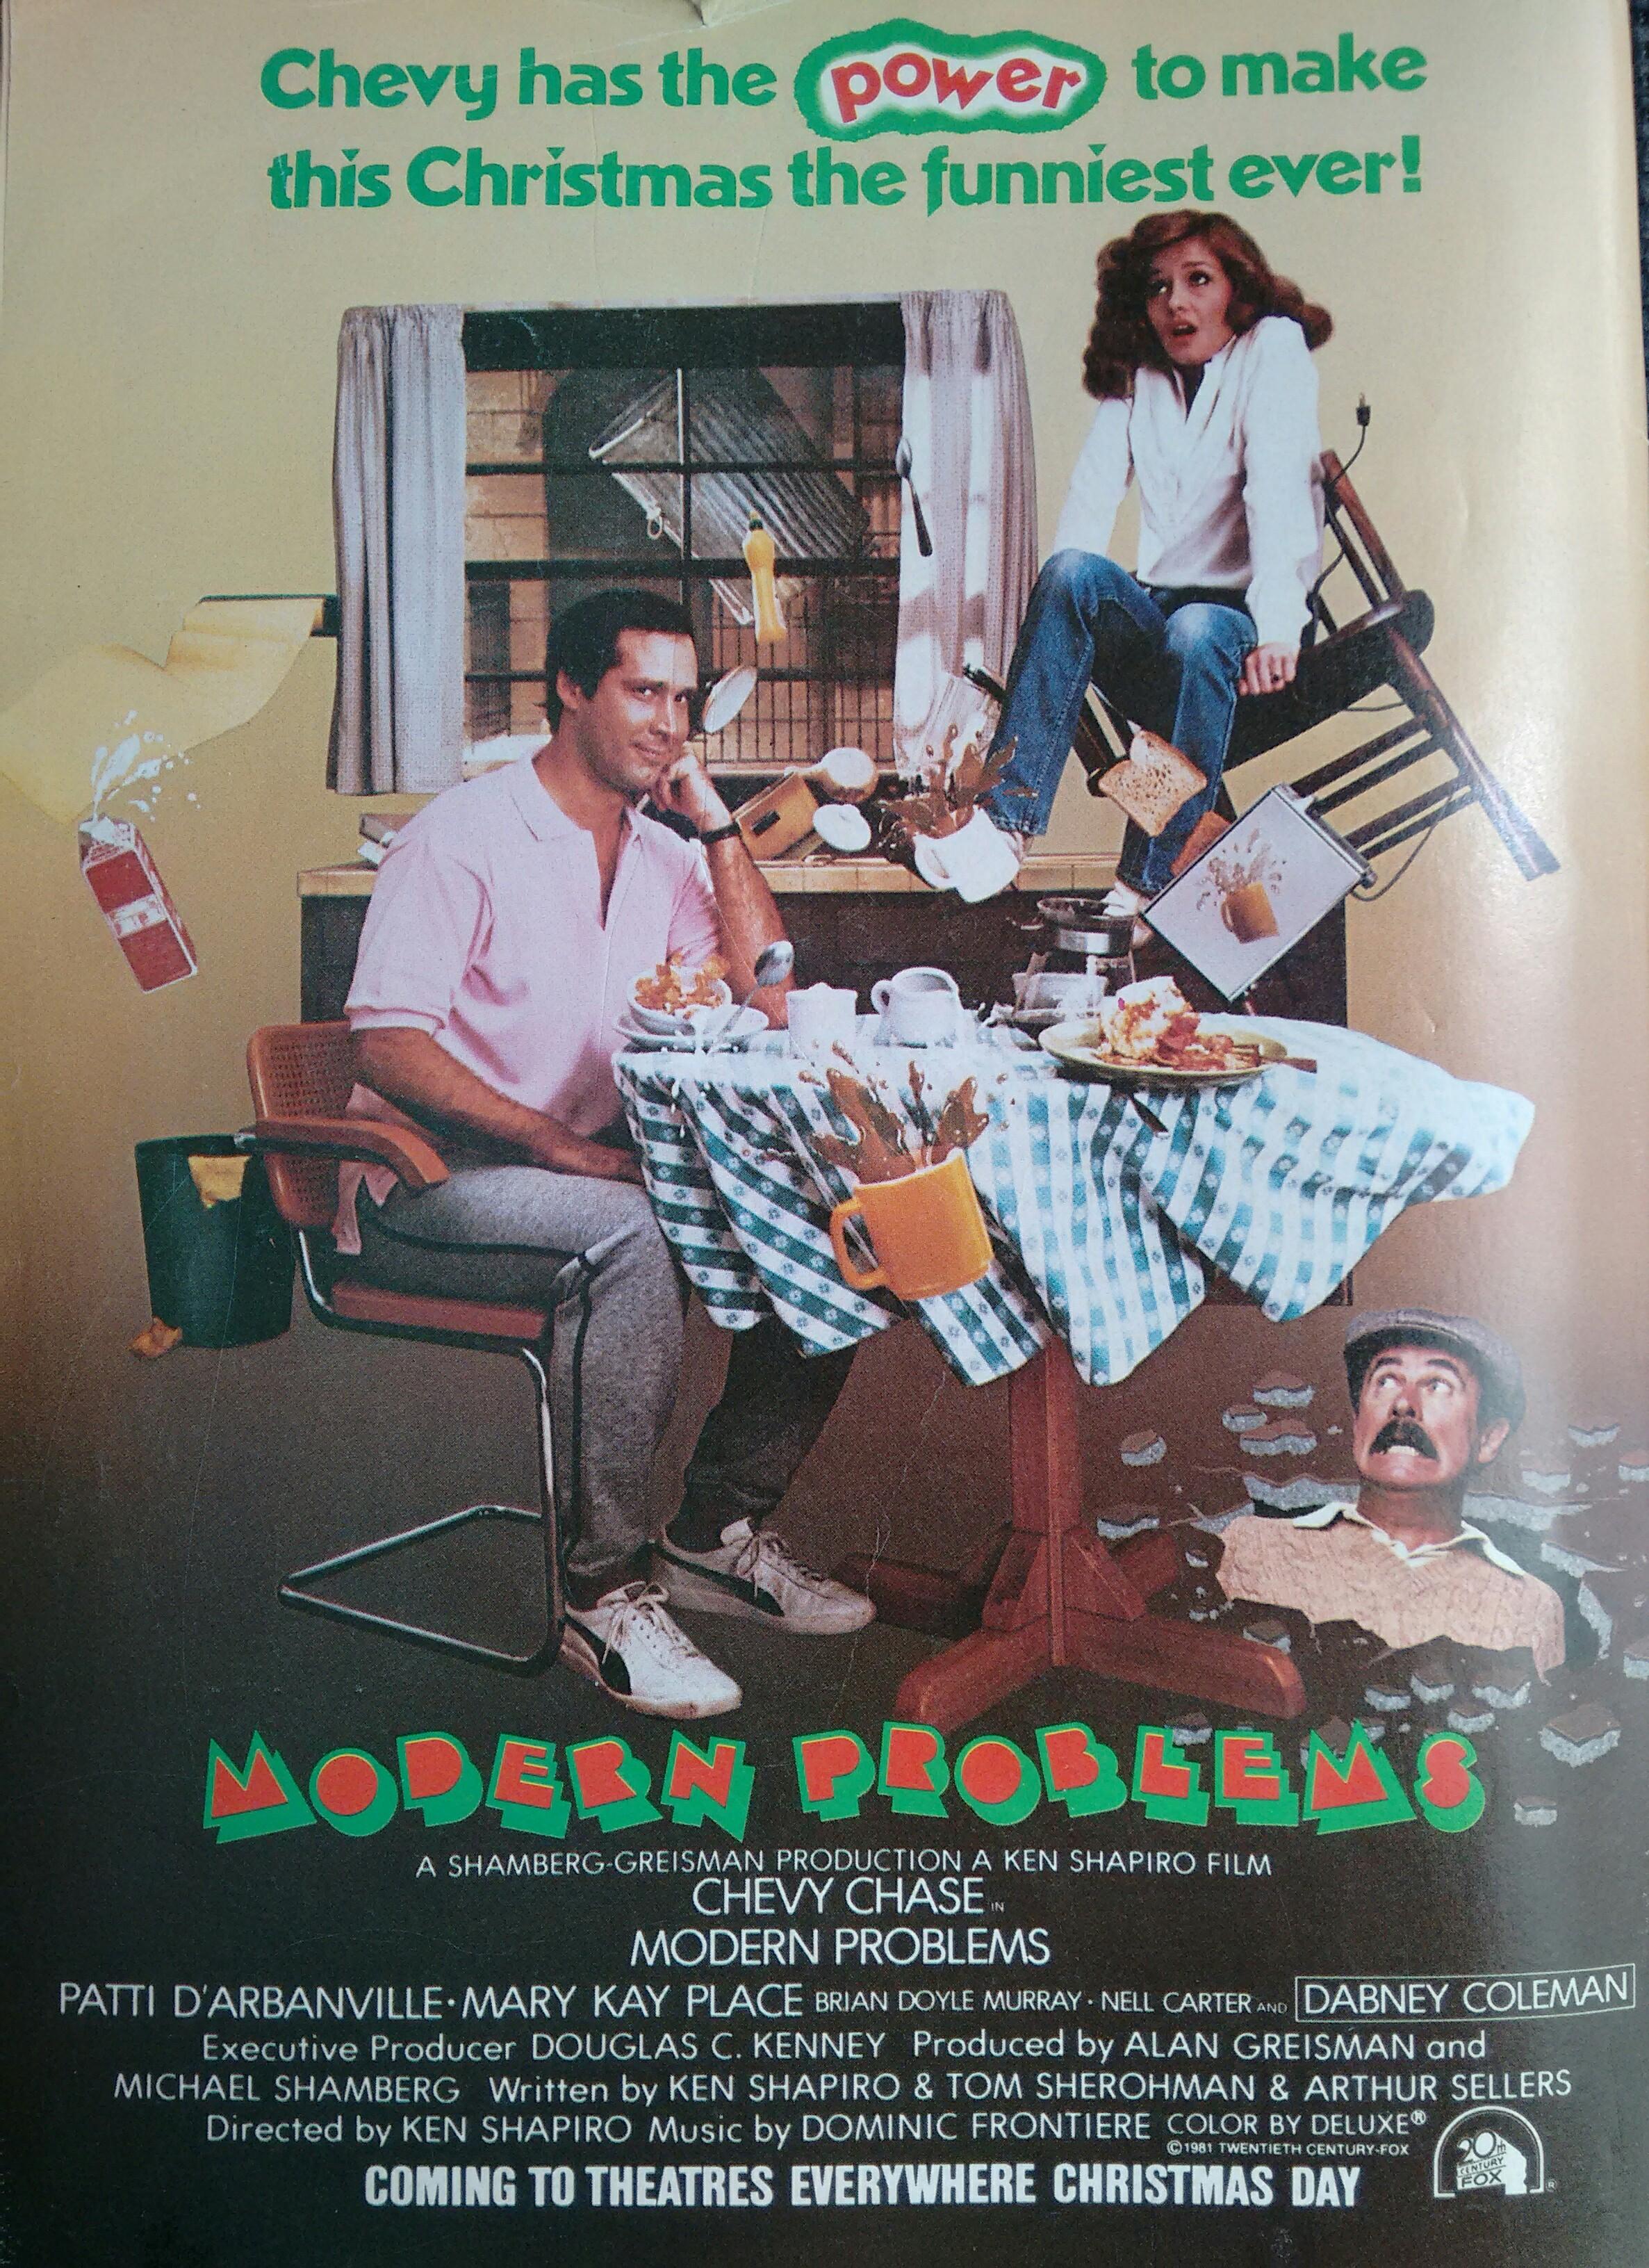 modern-problems-starlog-magazine-advertisement-movie-poster